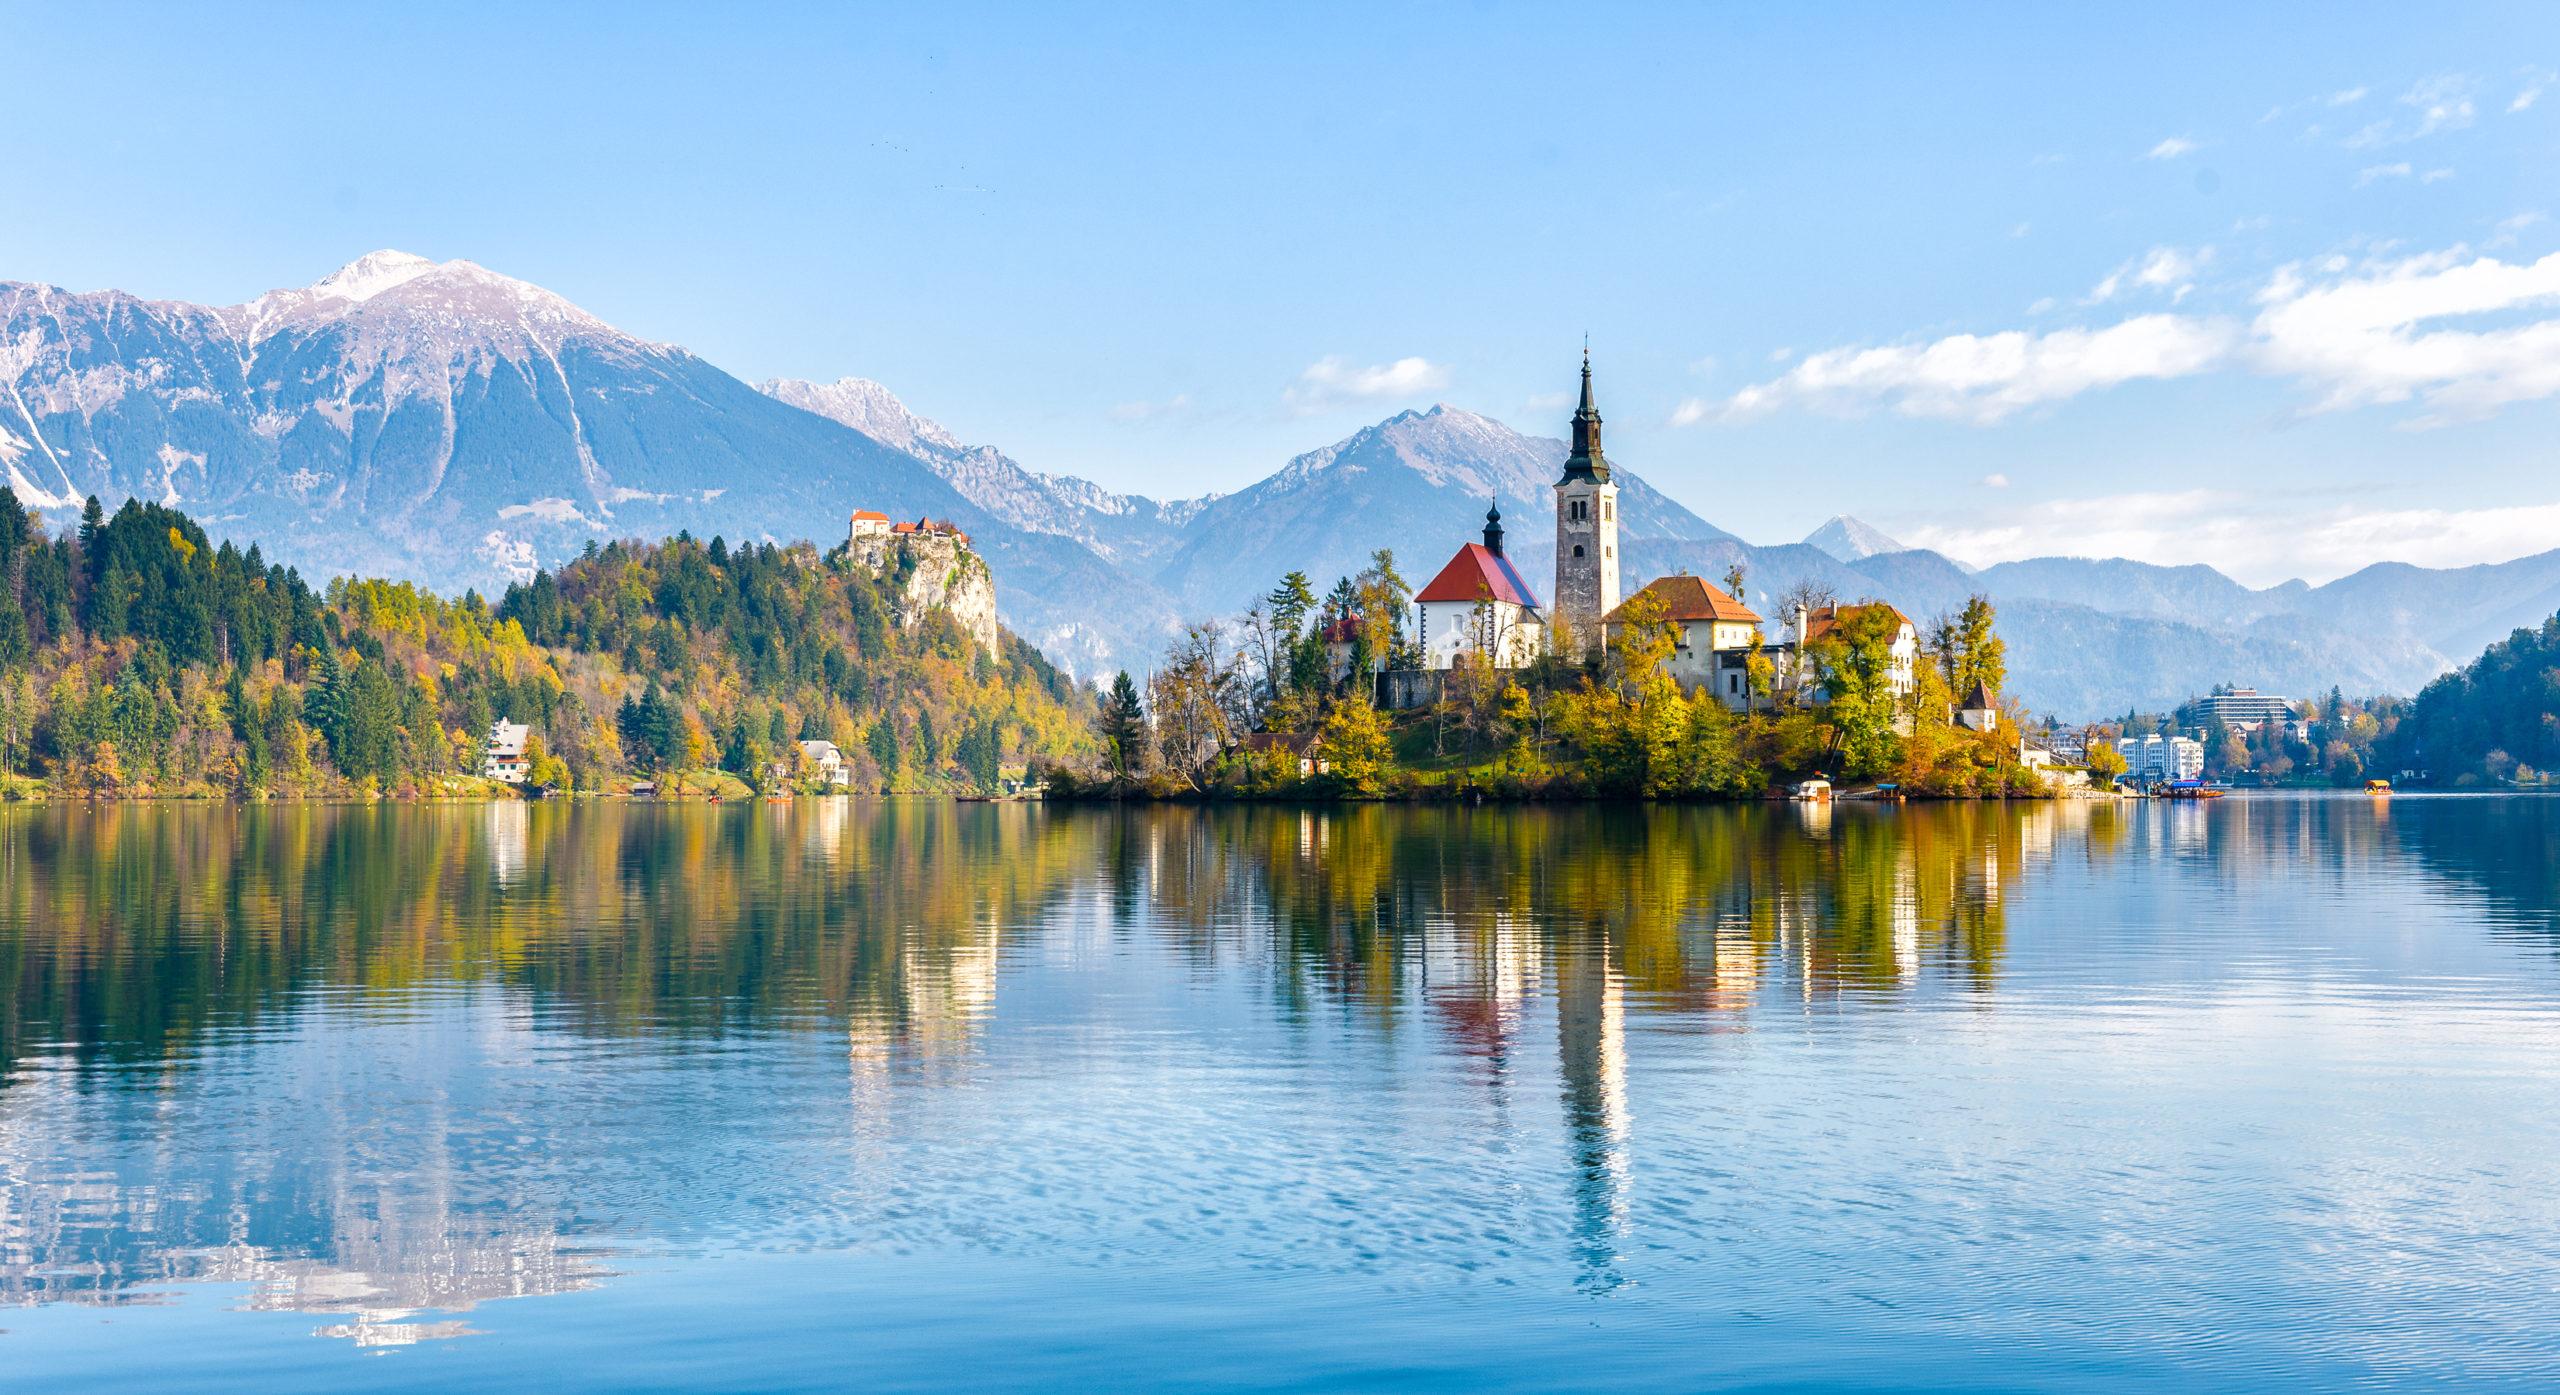 Slovenia [Shutterstock]